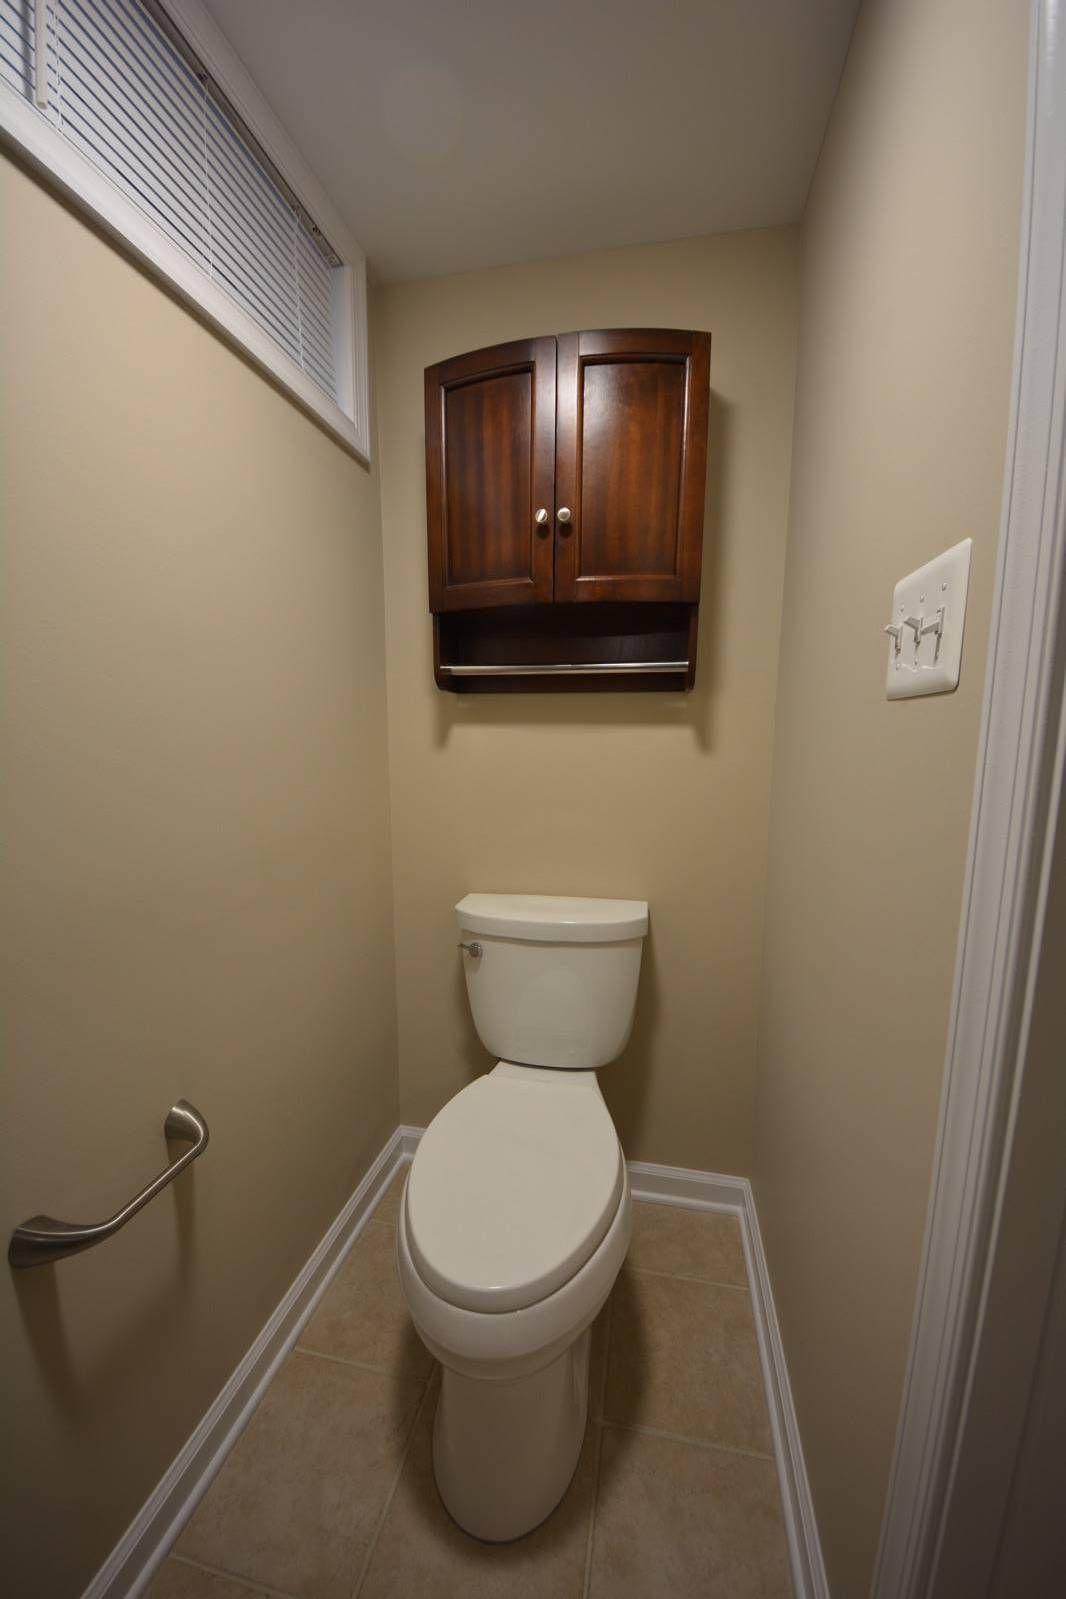 Basement Bathroom Shower Ideas Basementbathroomideas Basement Bathroom Lighting Want To Try This Id Small Basement Bathroom Basement Bathroom Small Basements